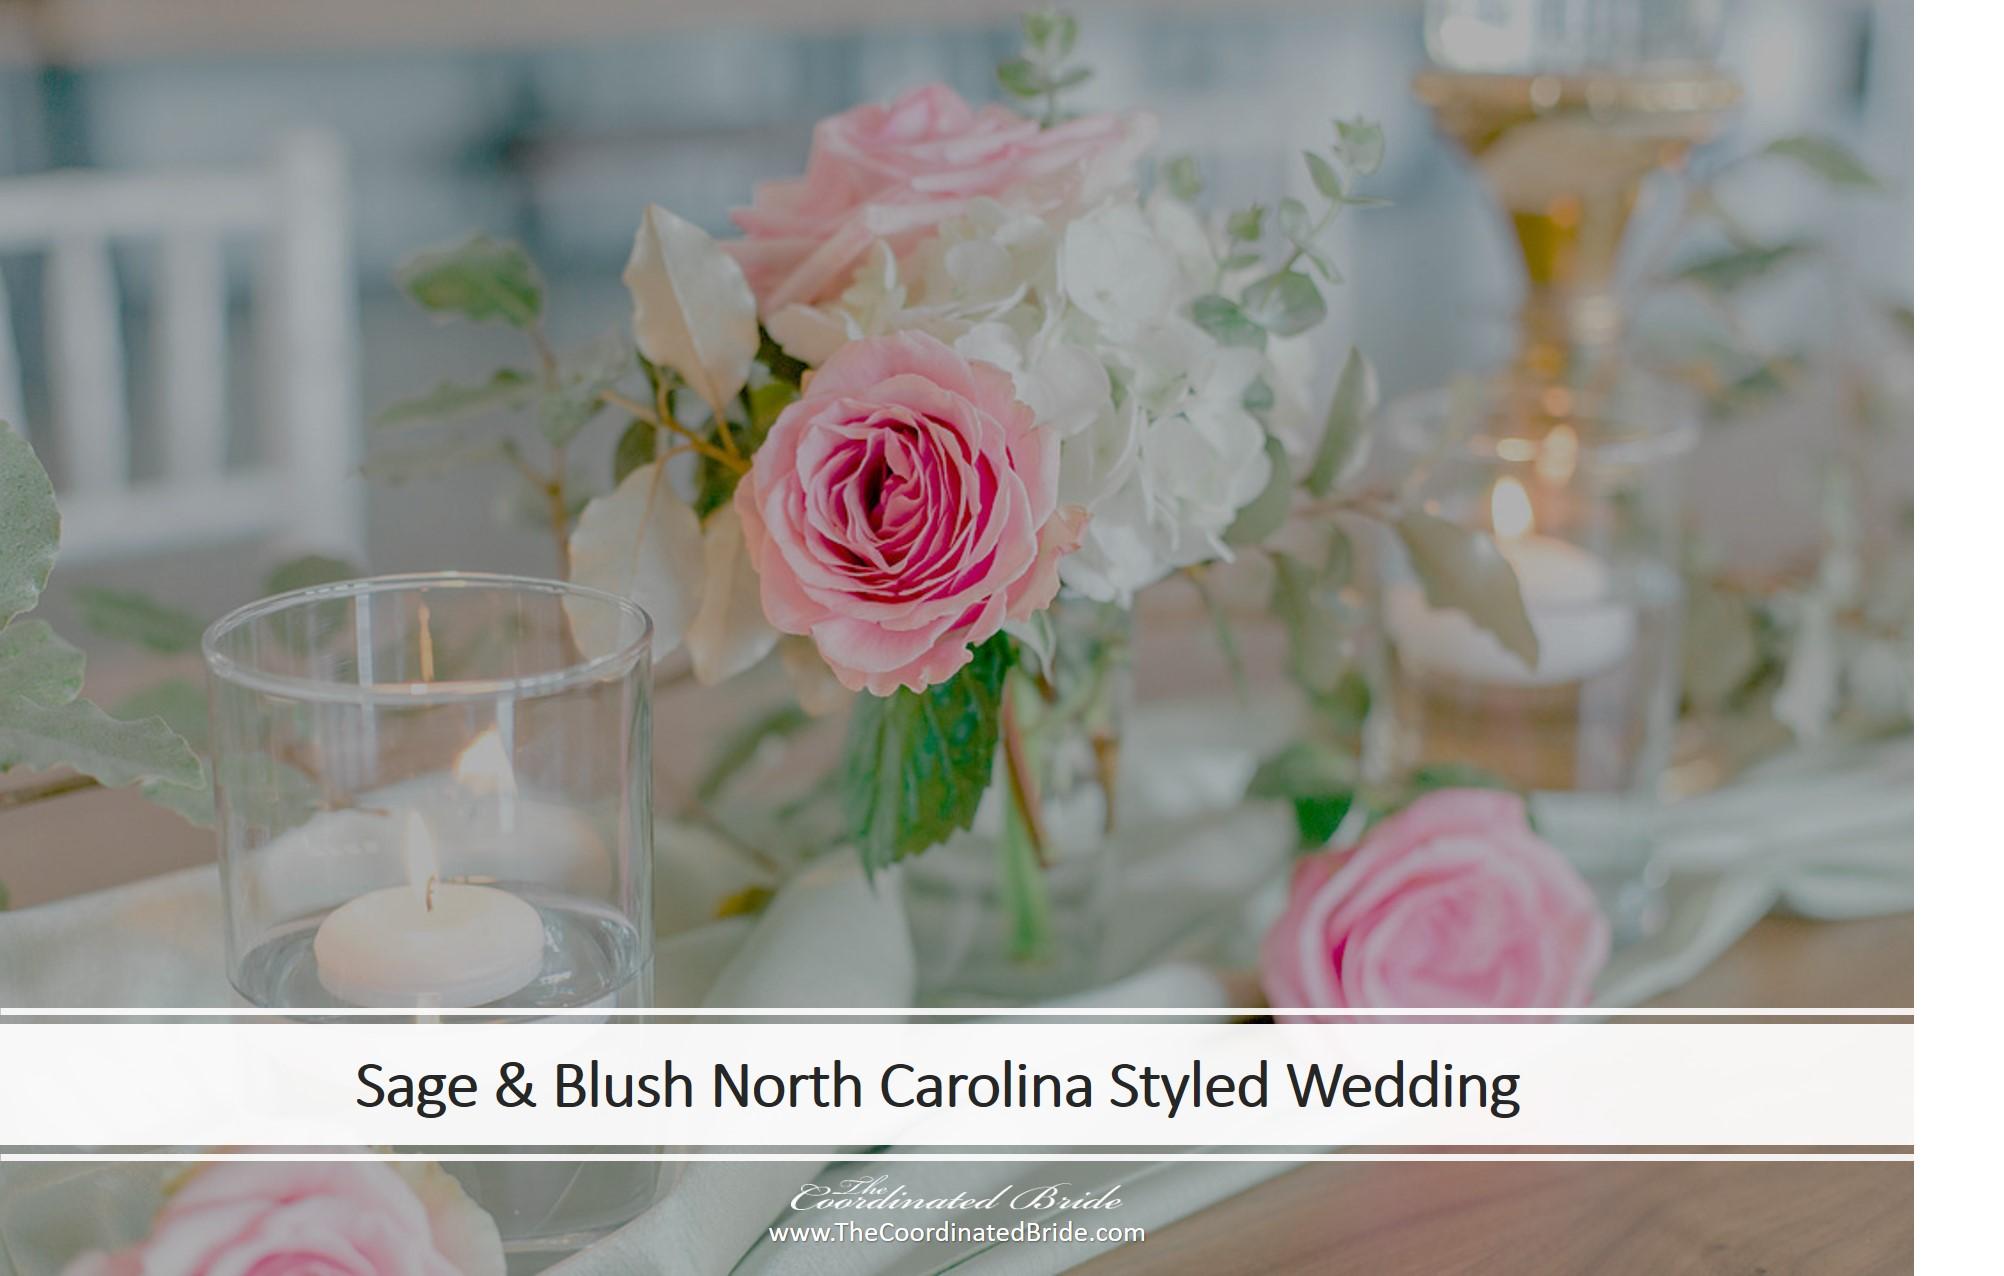 Sage & Blush North Carolina Styled Wedding